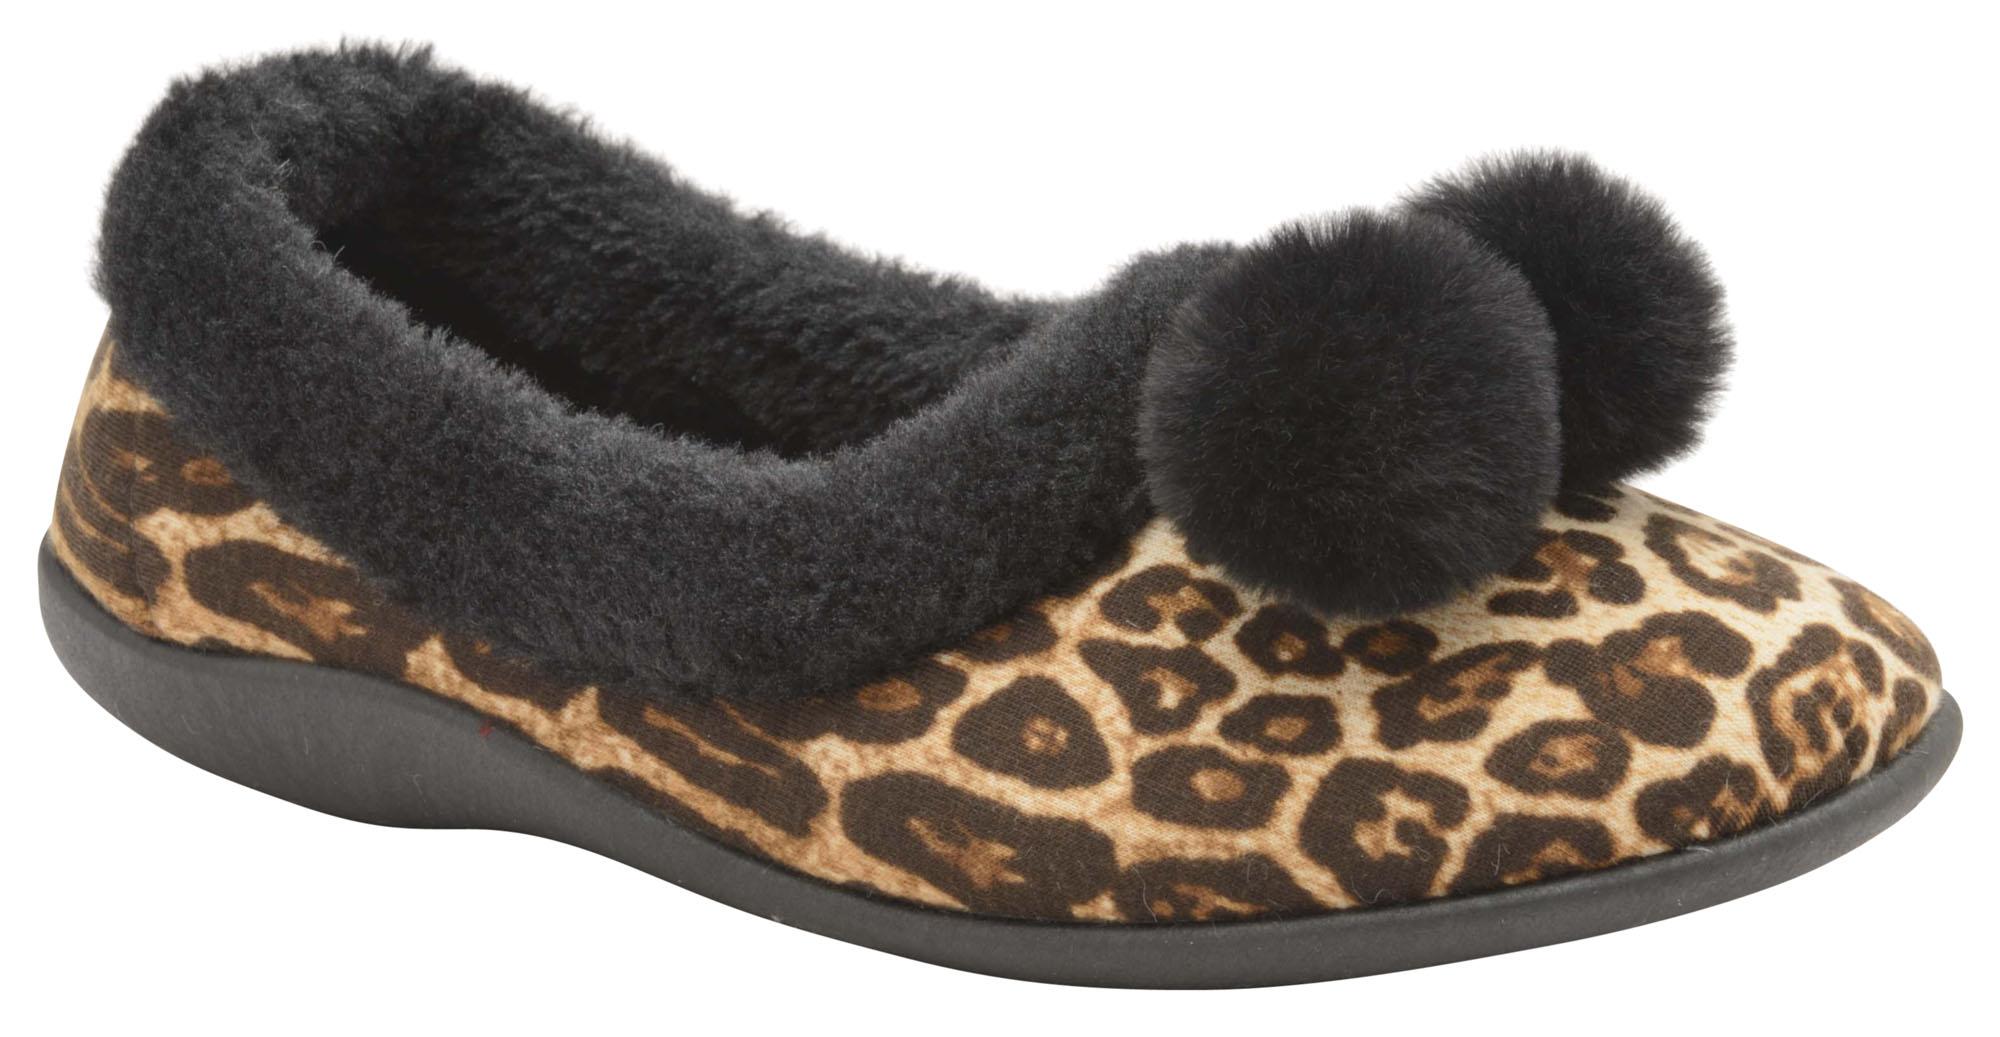 Dunlop Ladies Womens Slippers Leopard Print Memory Foam Faux Fur Collar Size 3-8